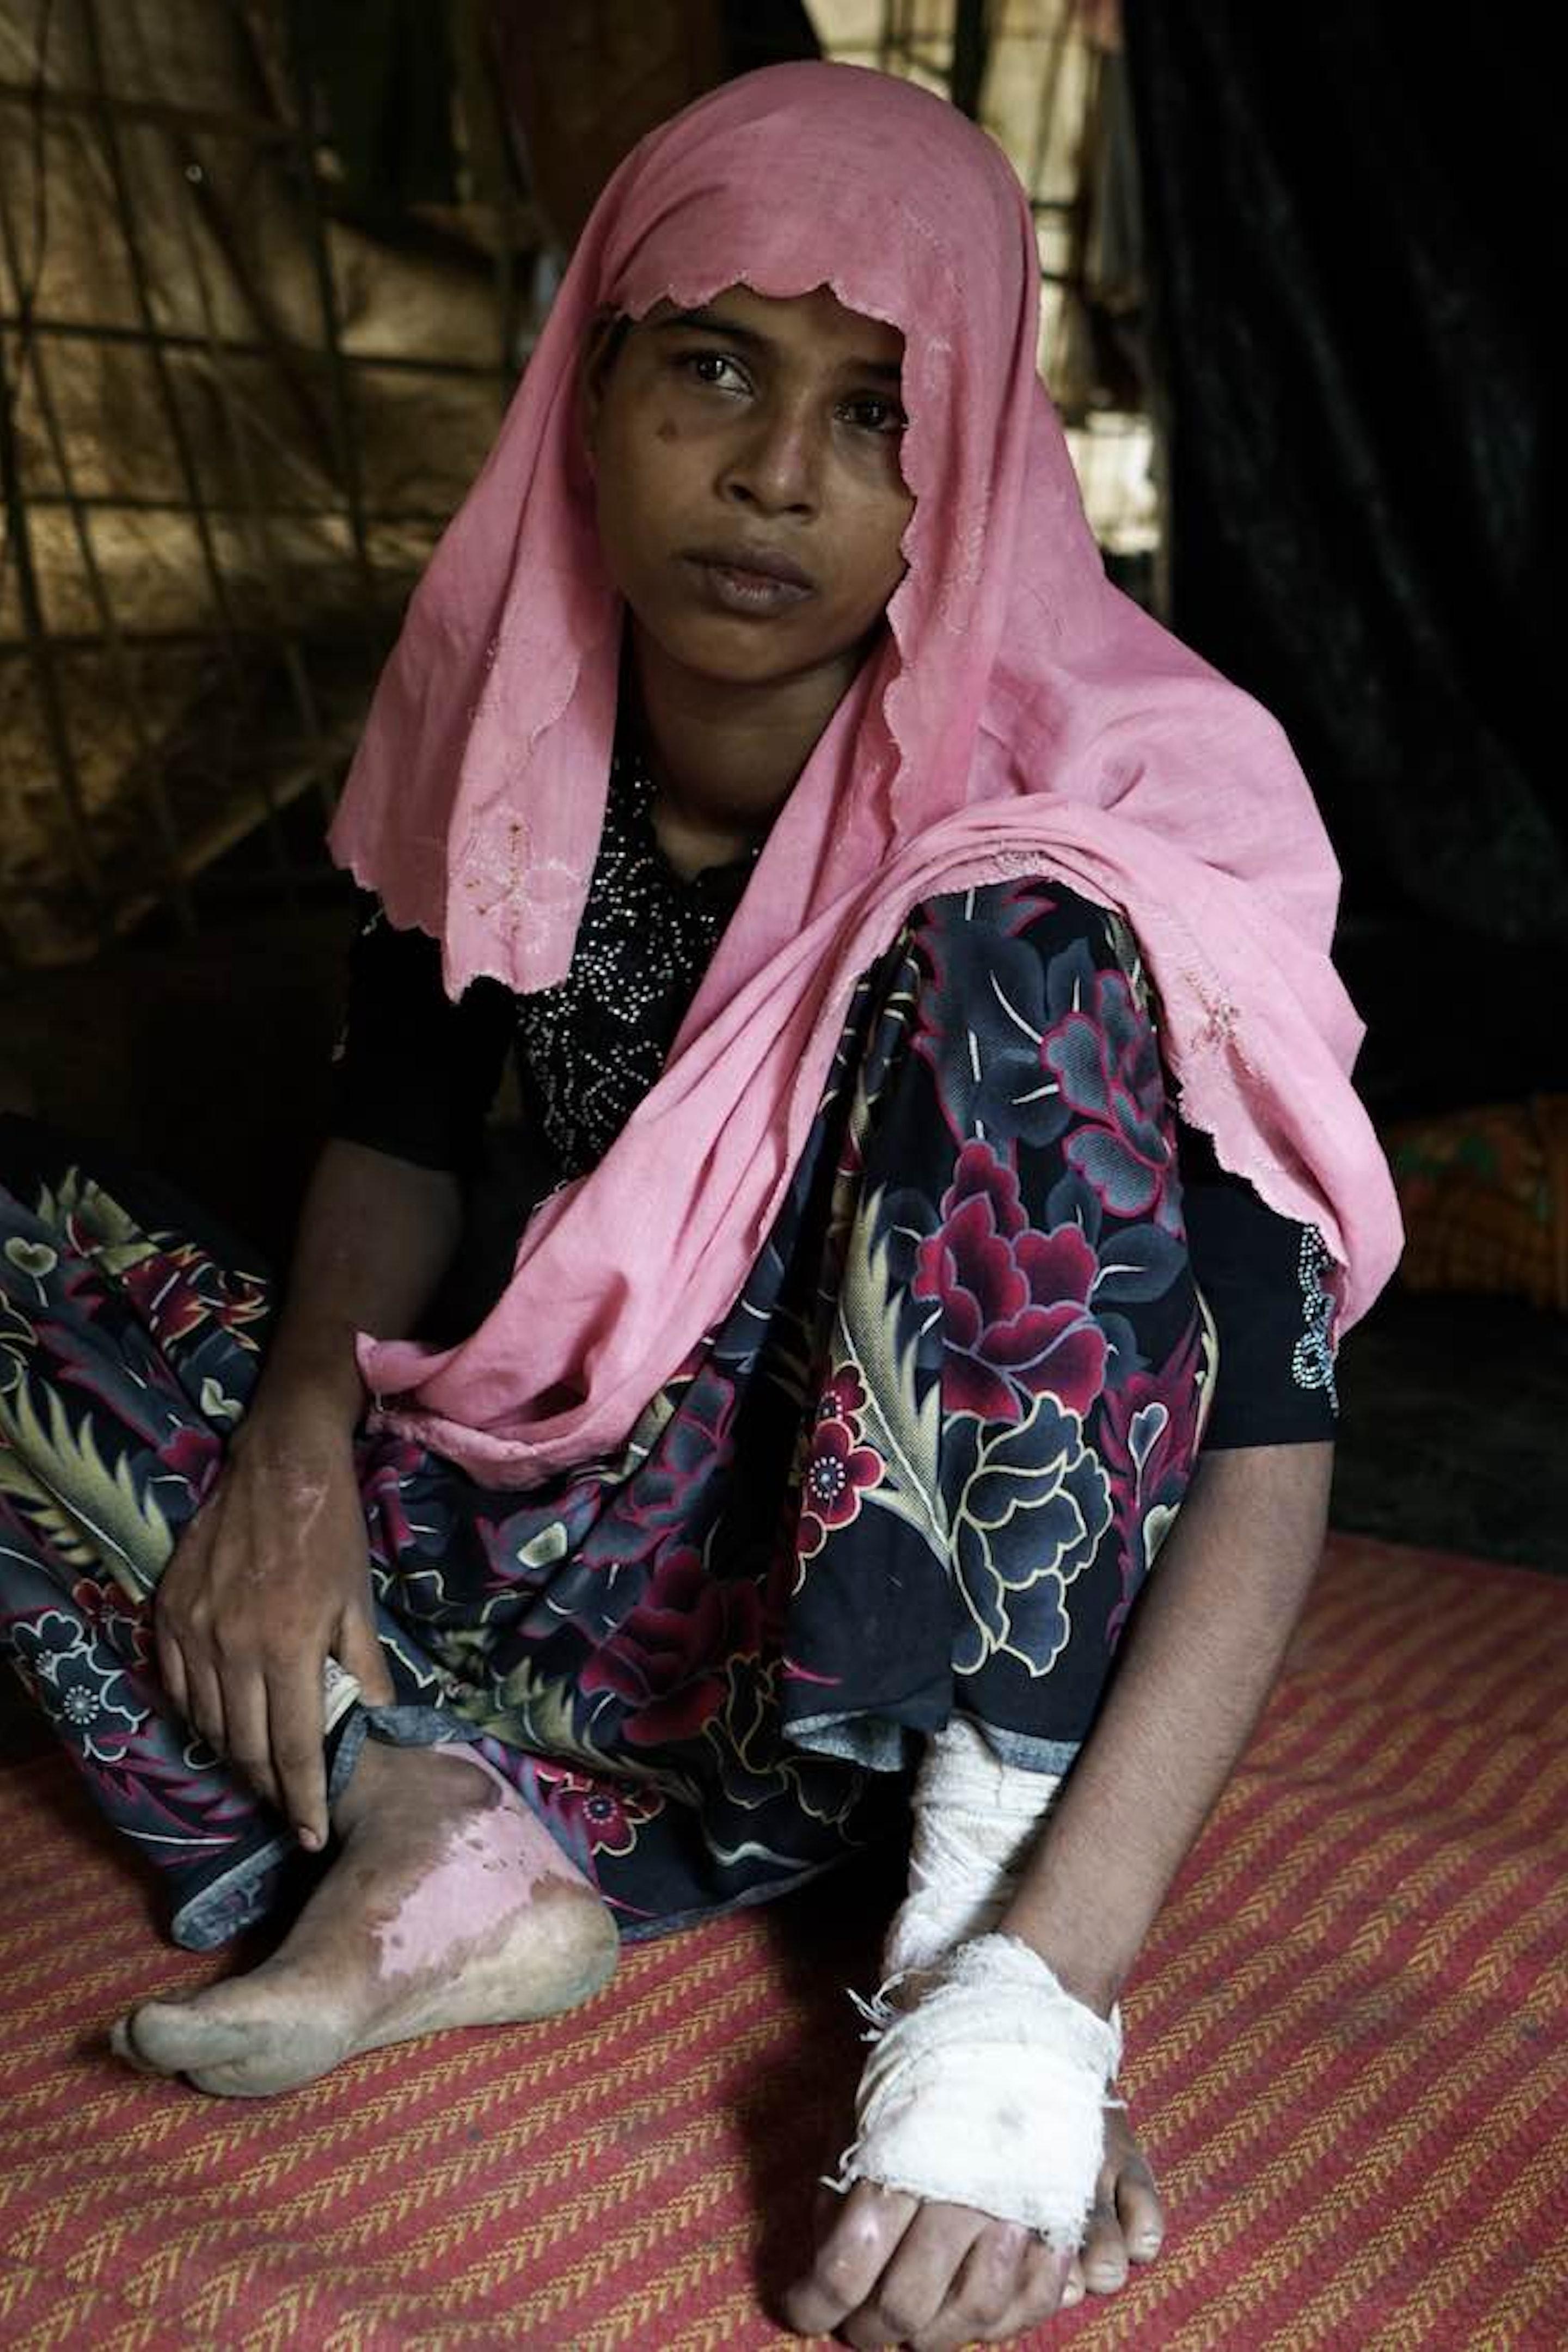 BBC World Service: how Tula Toli massacre was preplanned